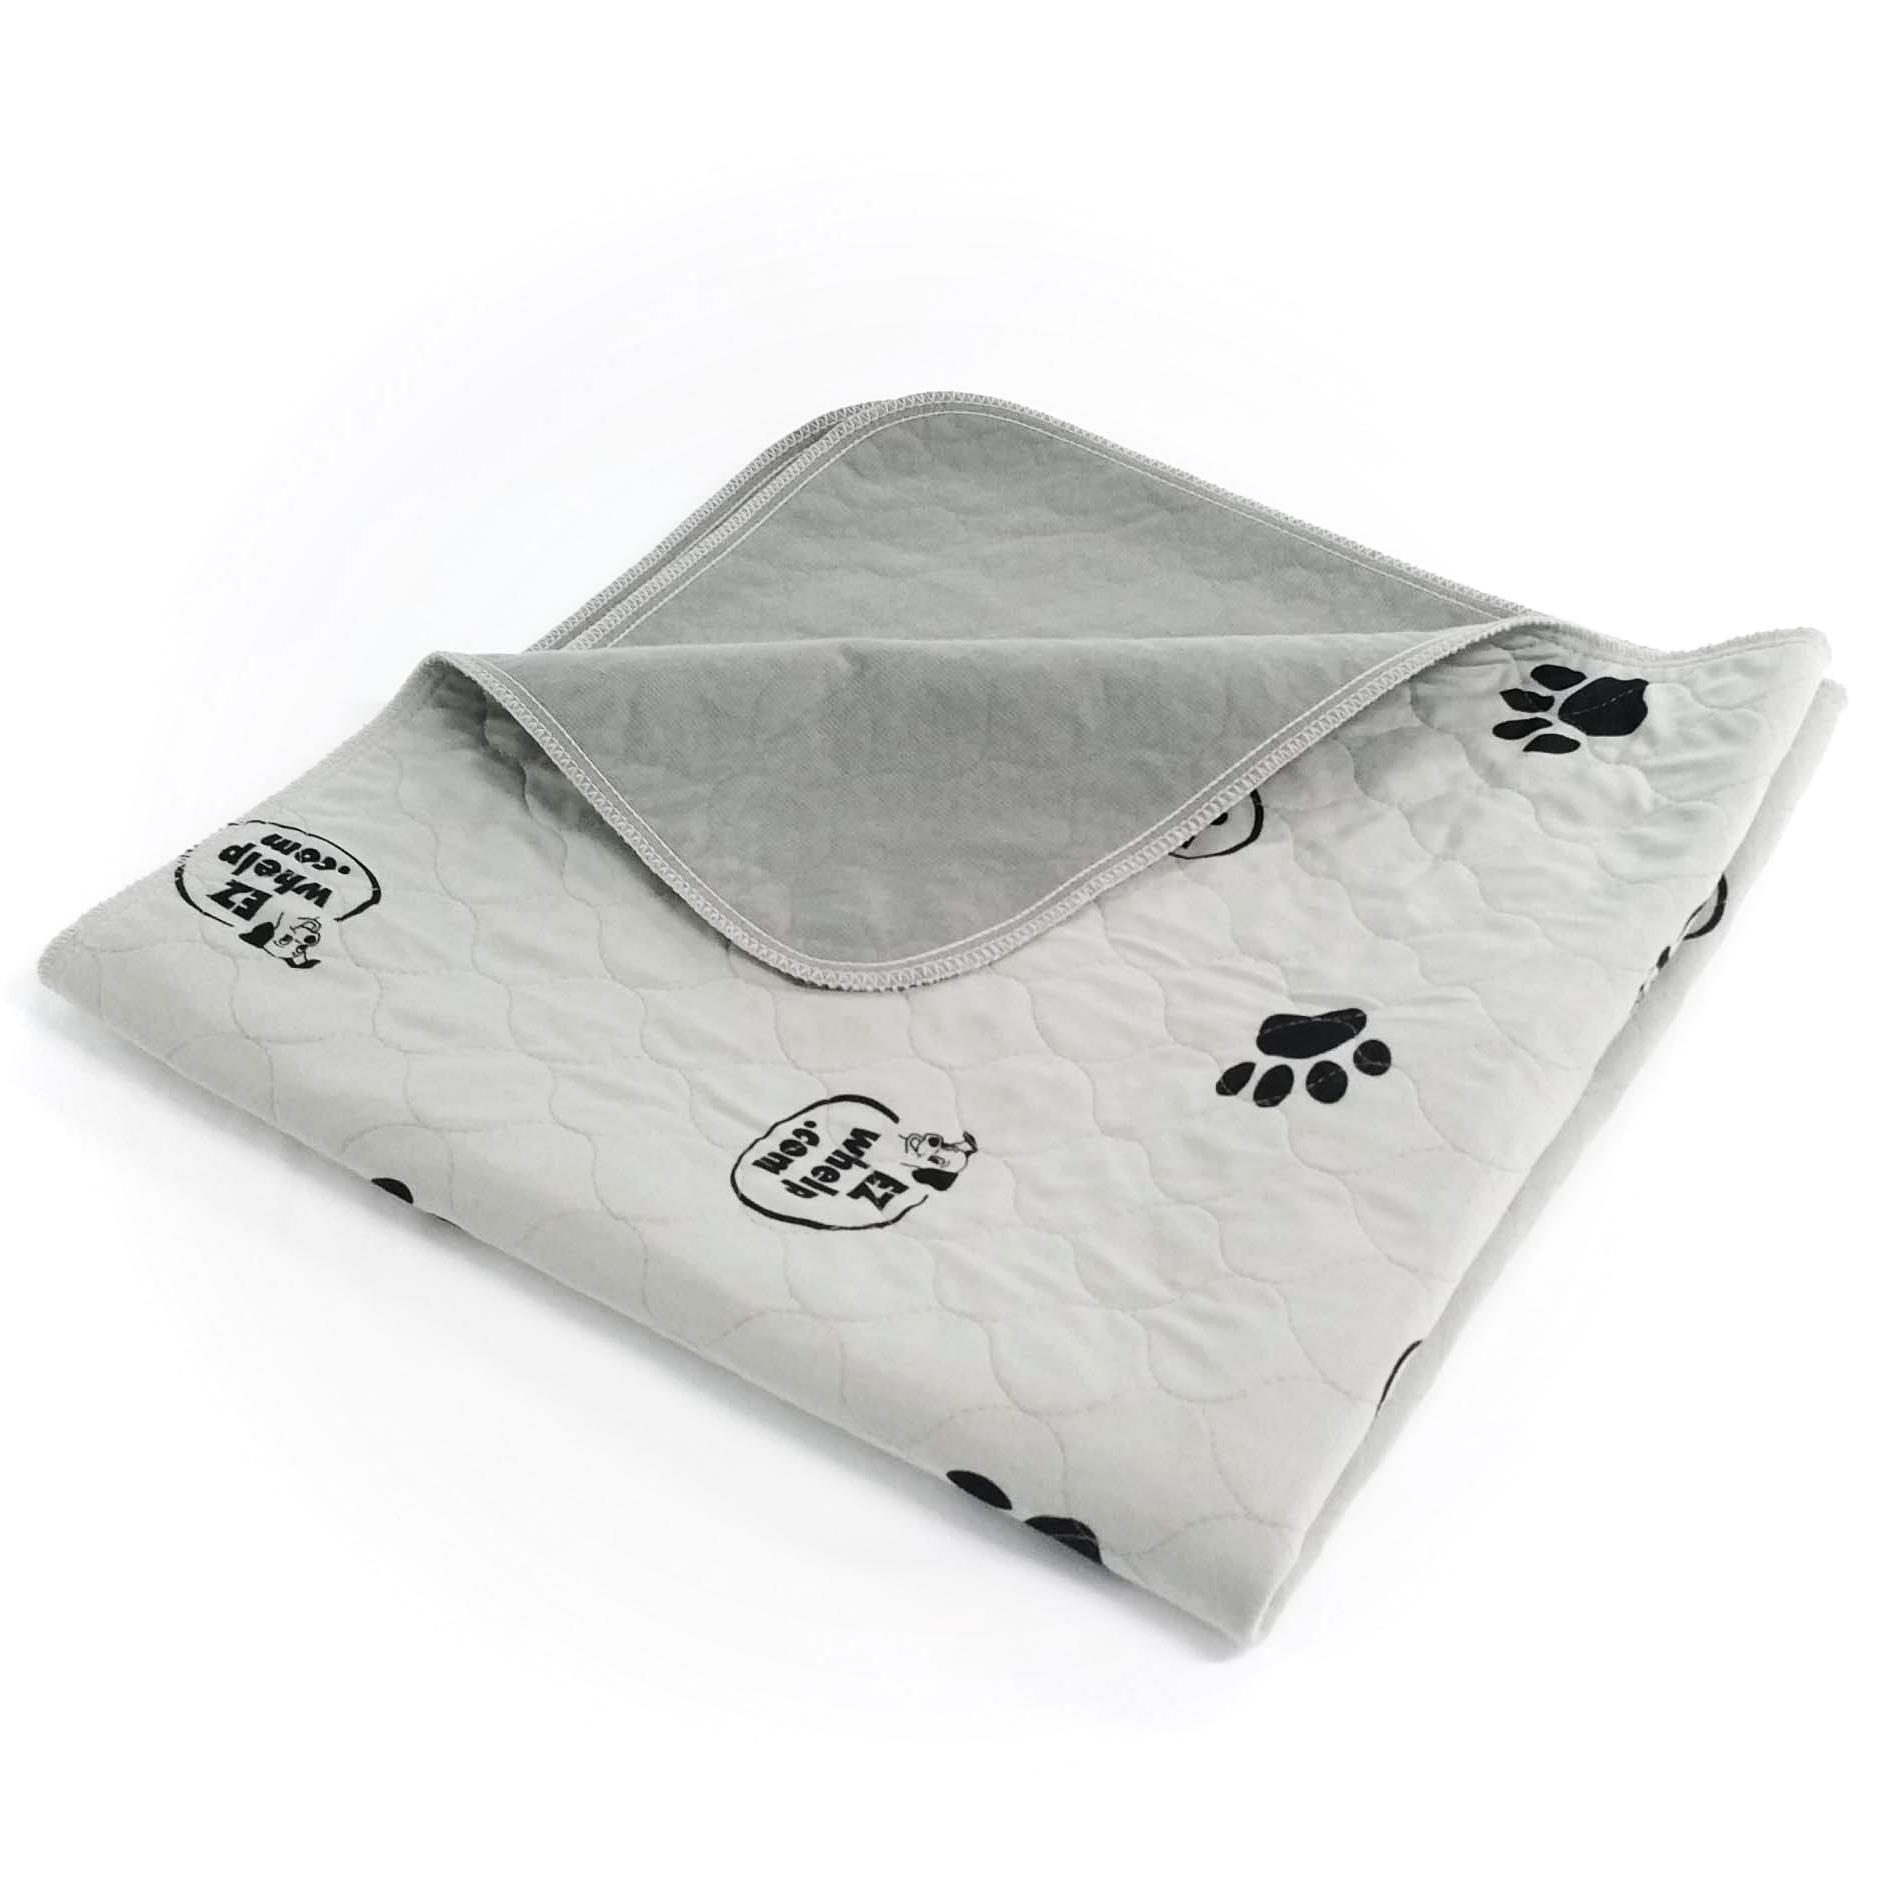 Gray Paw Print Pad/Mat Dog crate pads, Whelping box